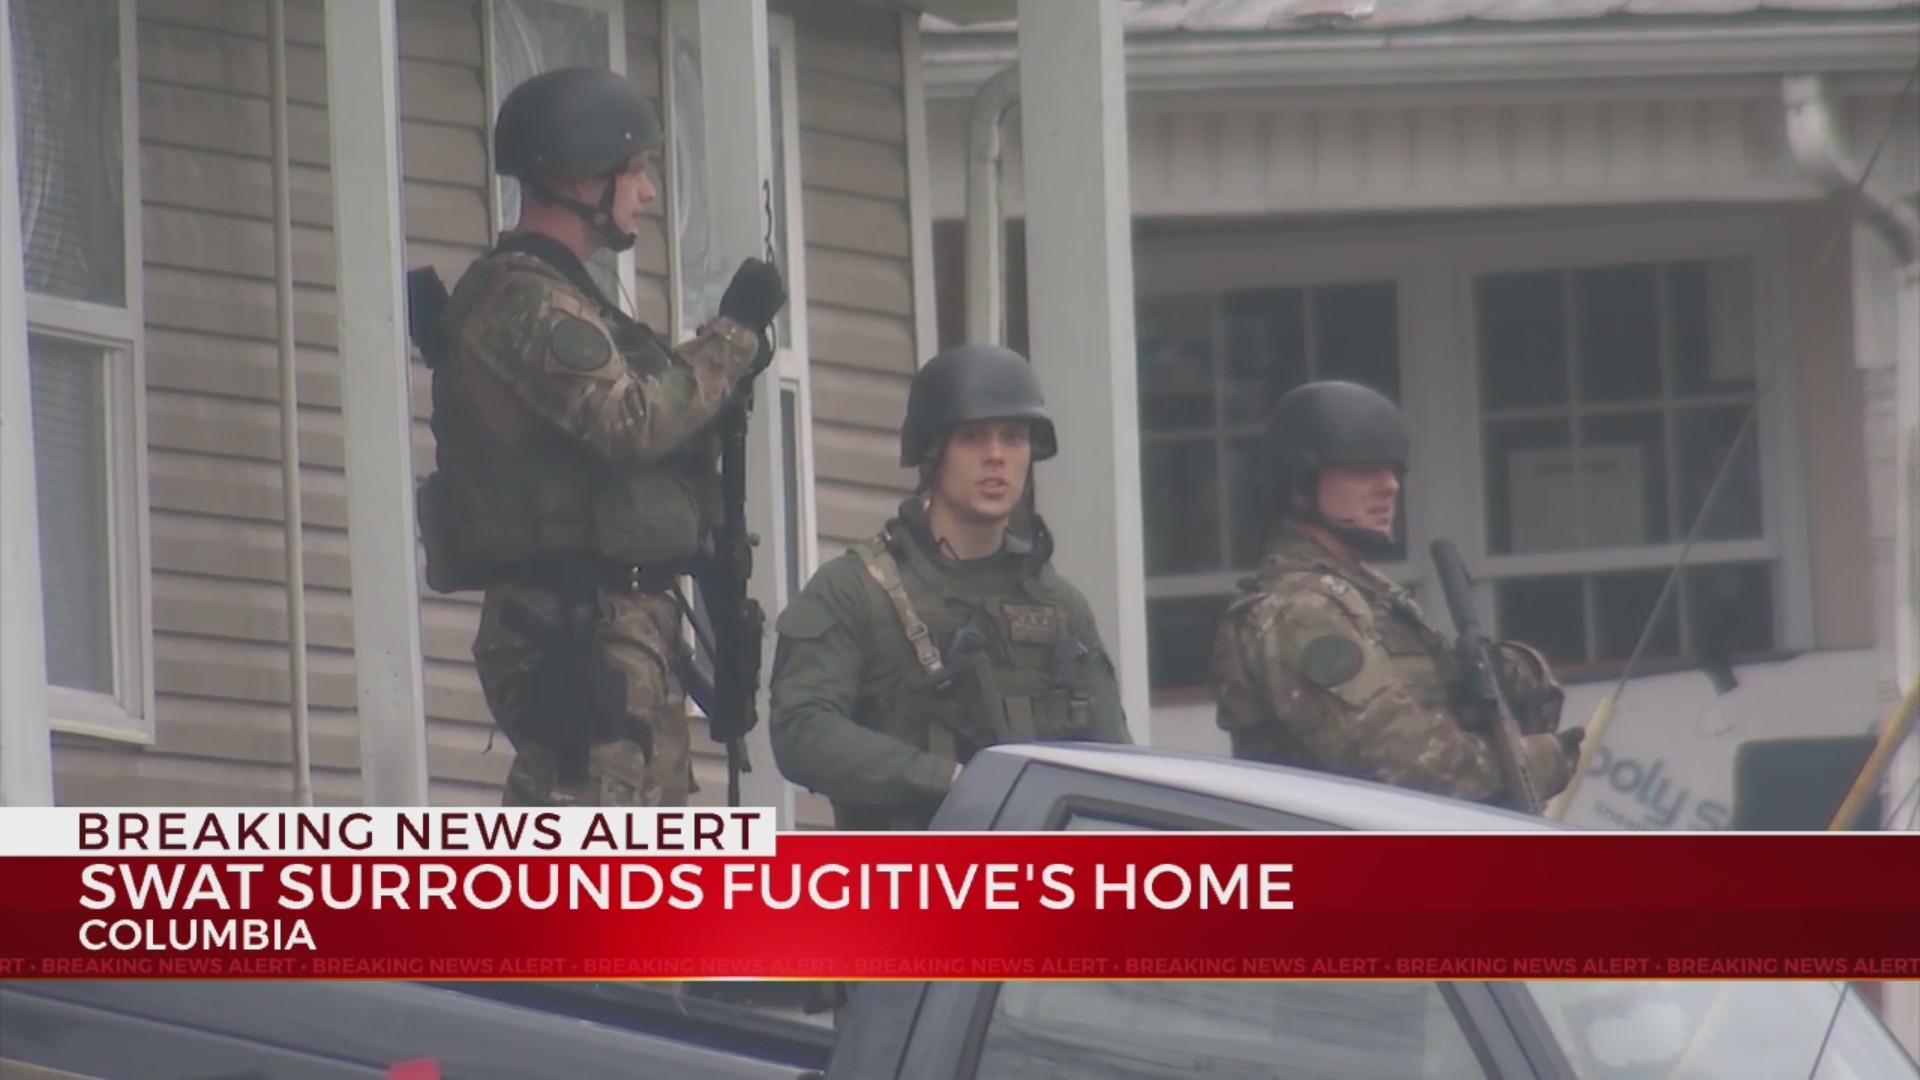 SWAT Team surrounds fugitive's home